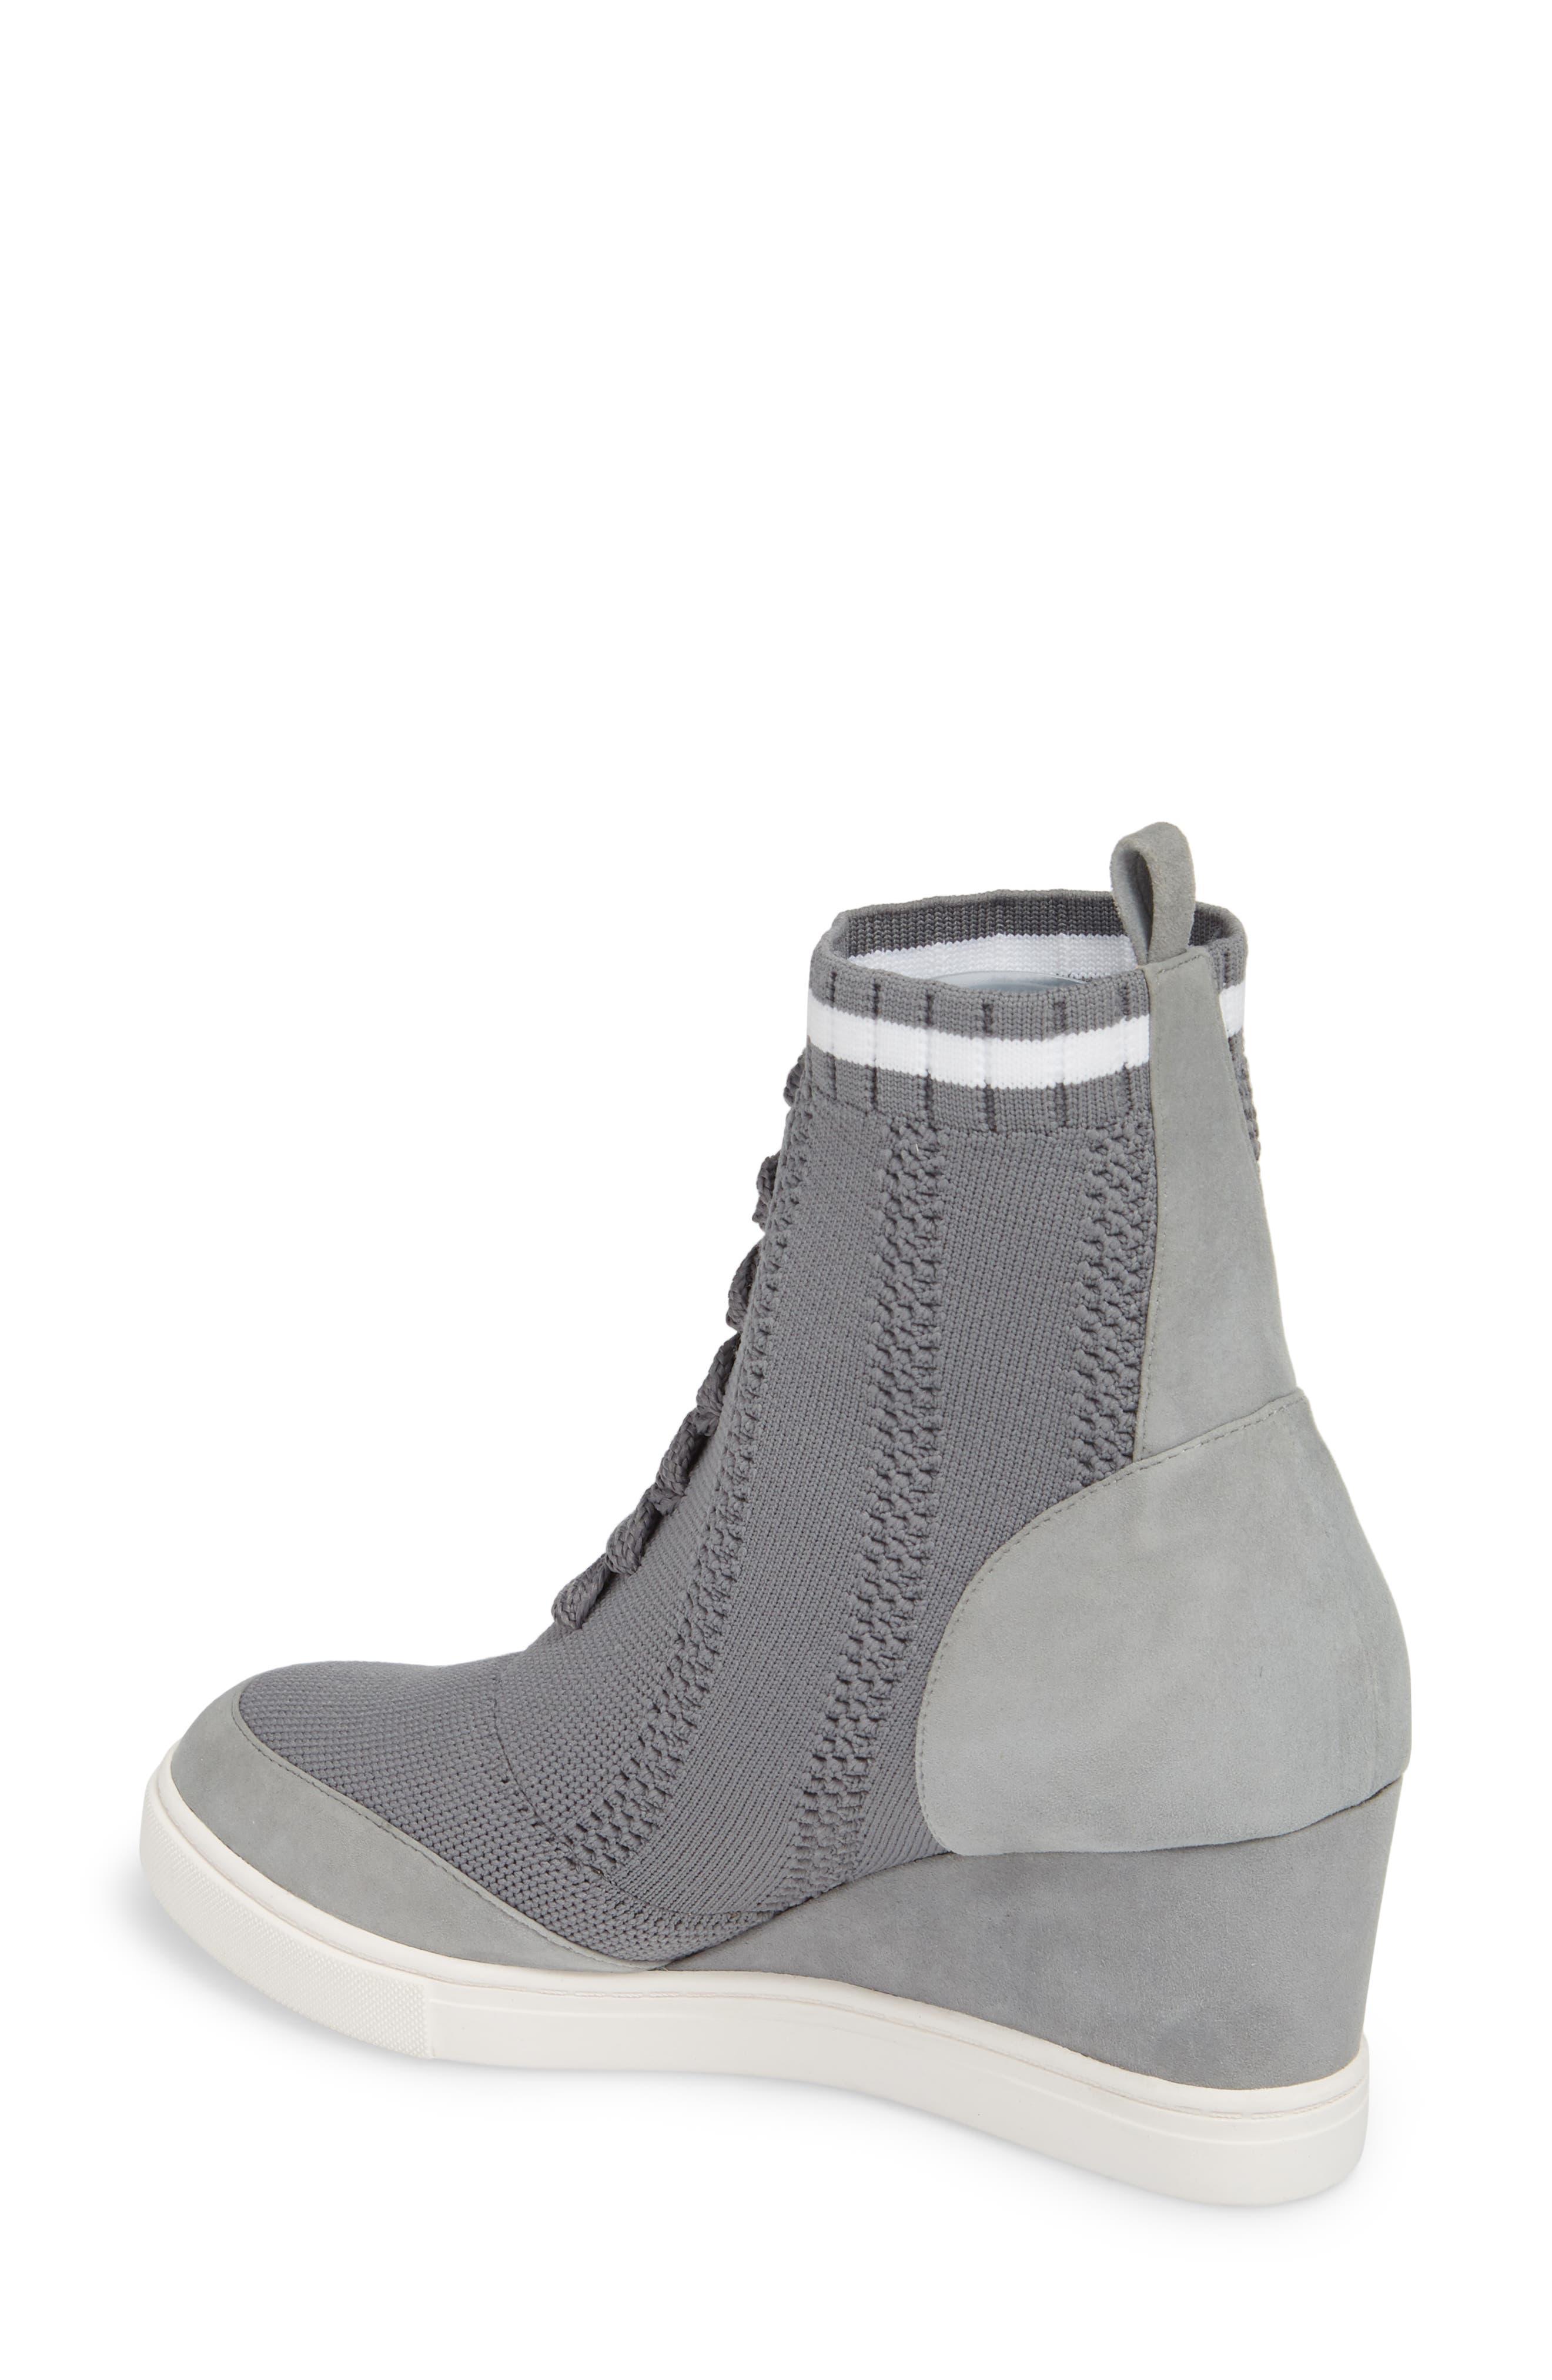 aaae151dead Grey Wedge Sneakers for Women